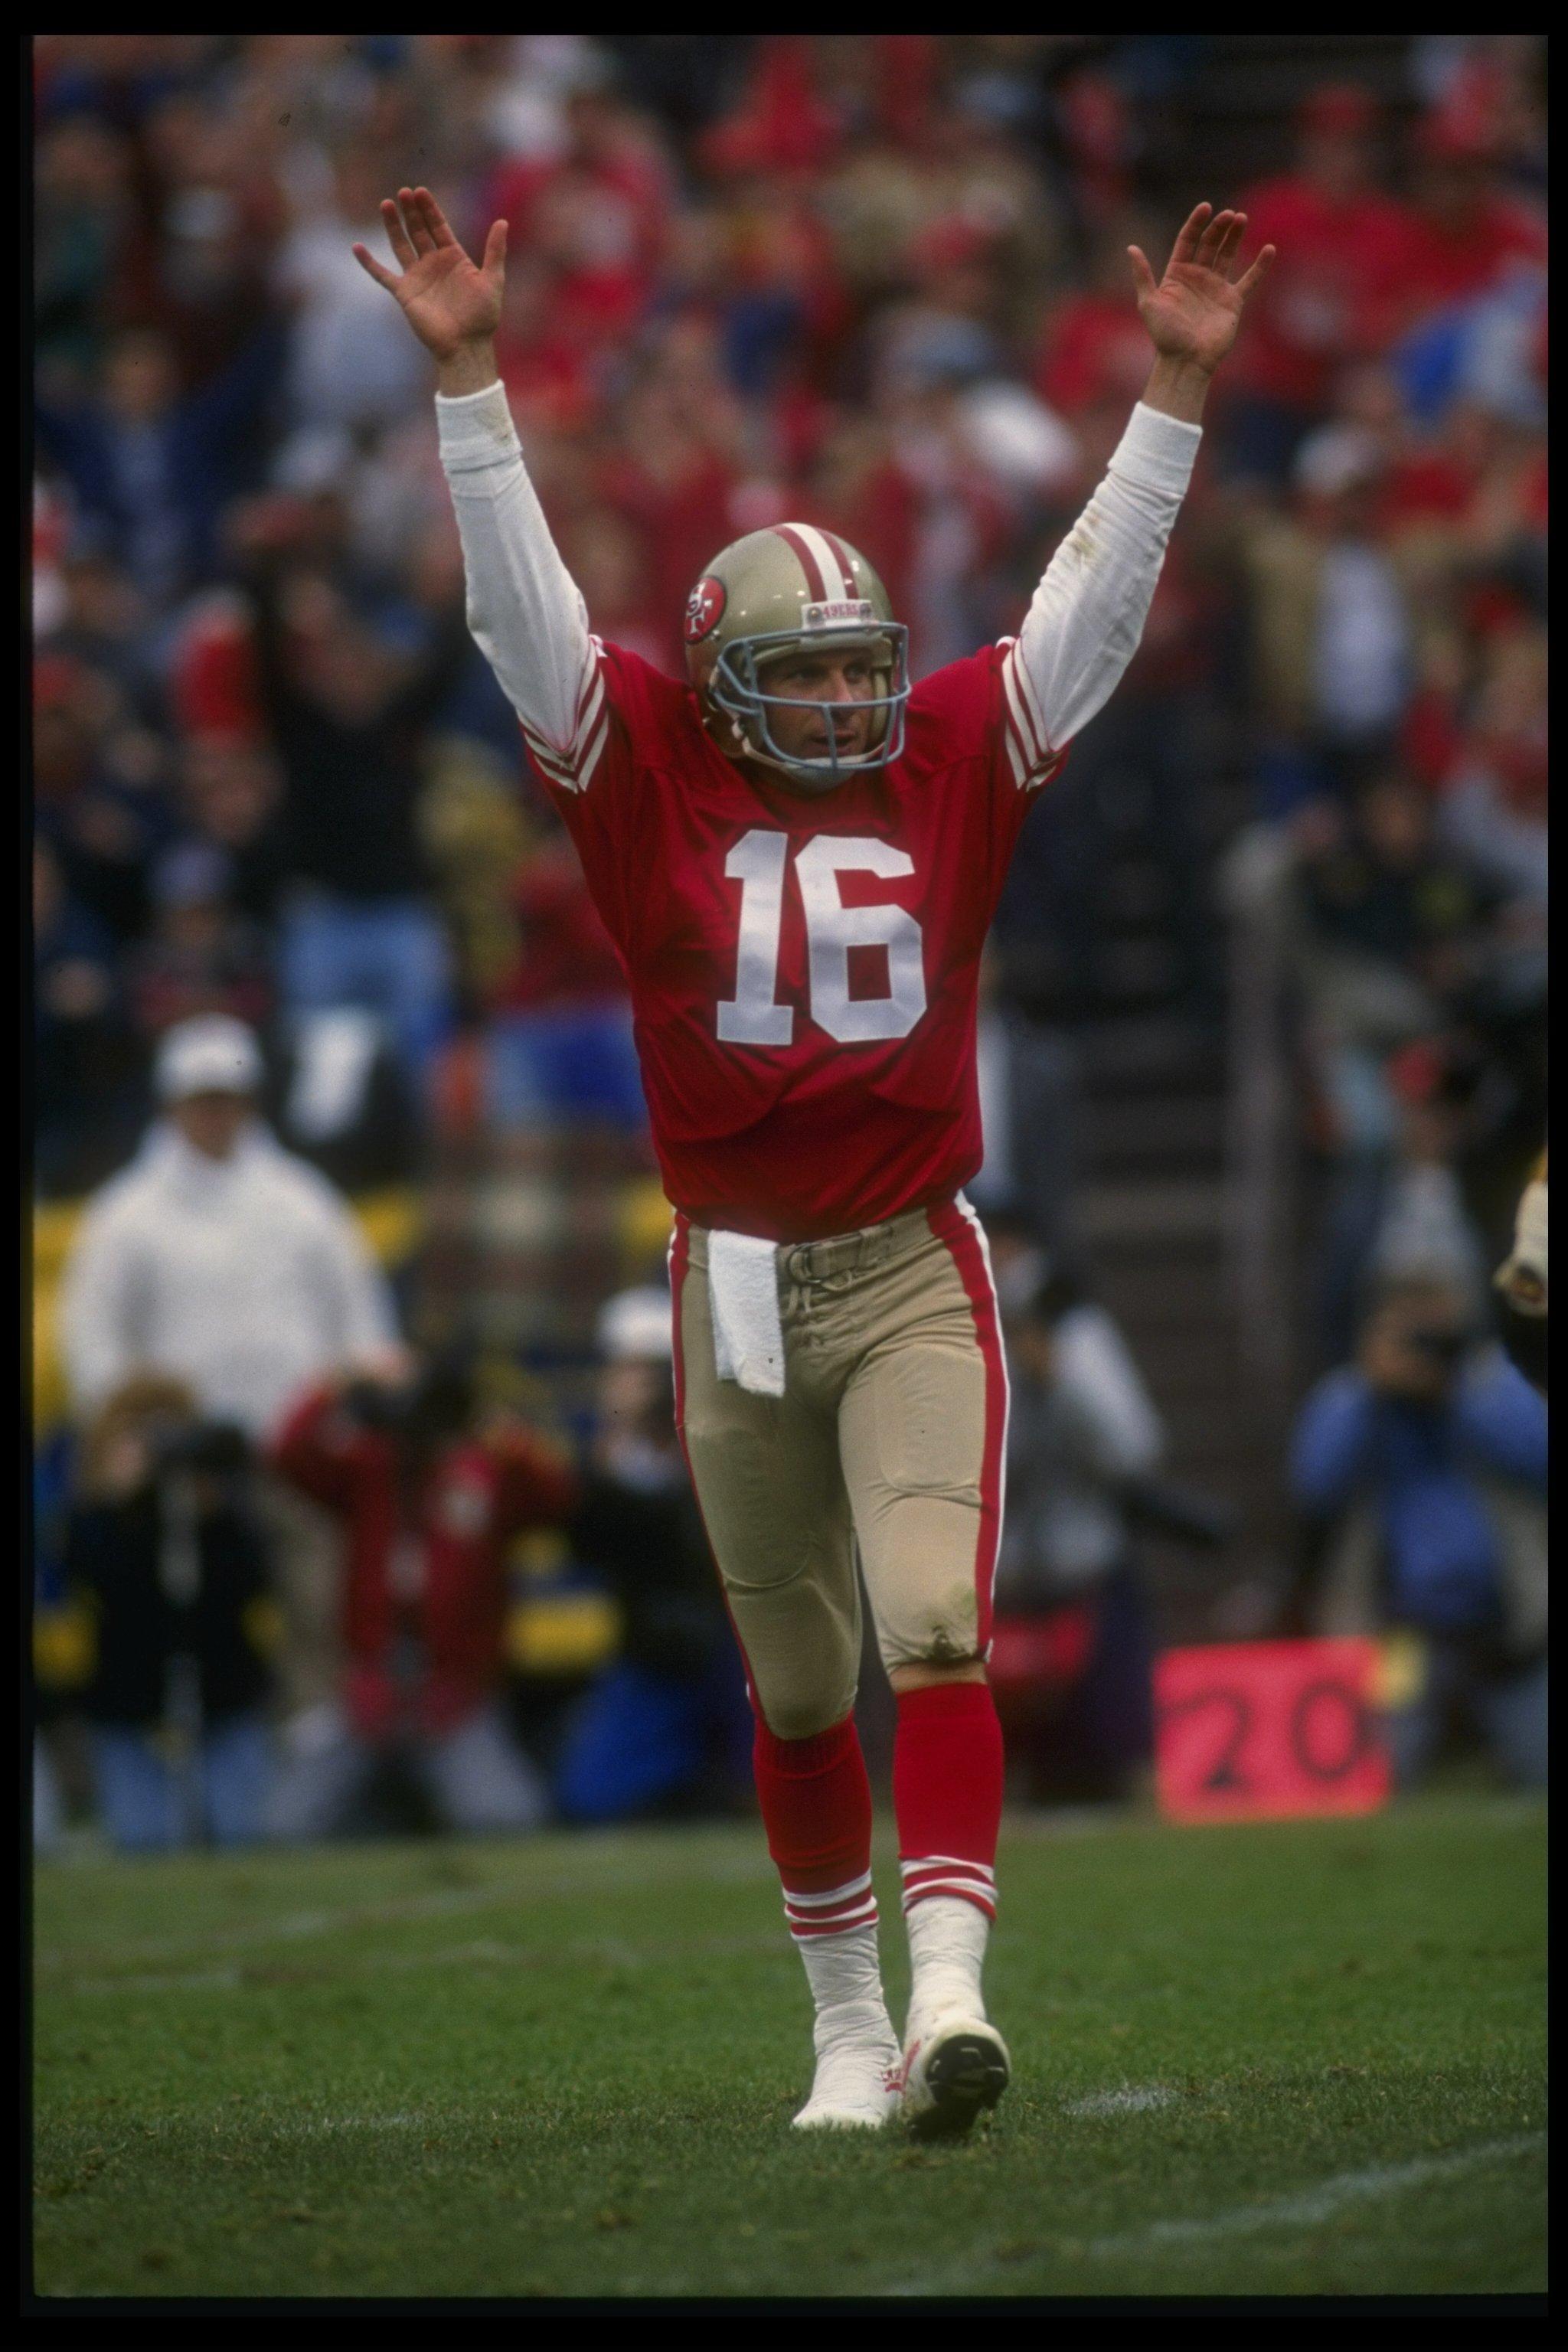 13 Jan 1991  Quarterback Joe Montana  16 of the San Francisco 49ers raises  his 9b35a3d58